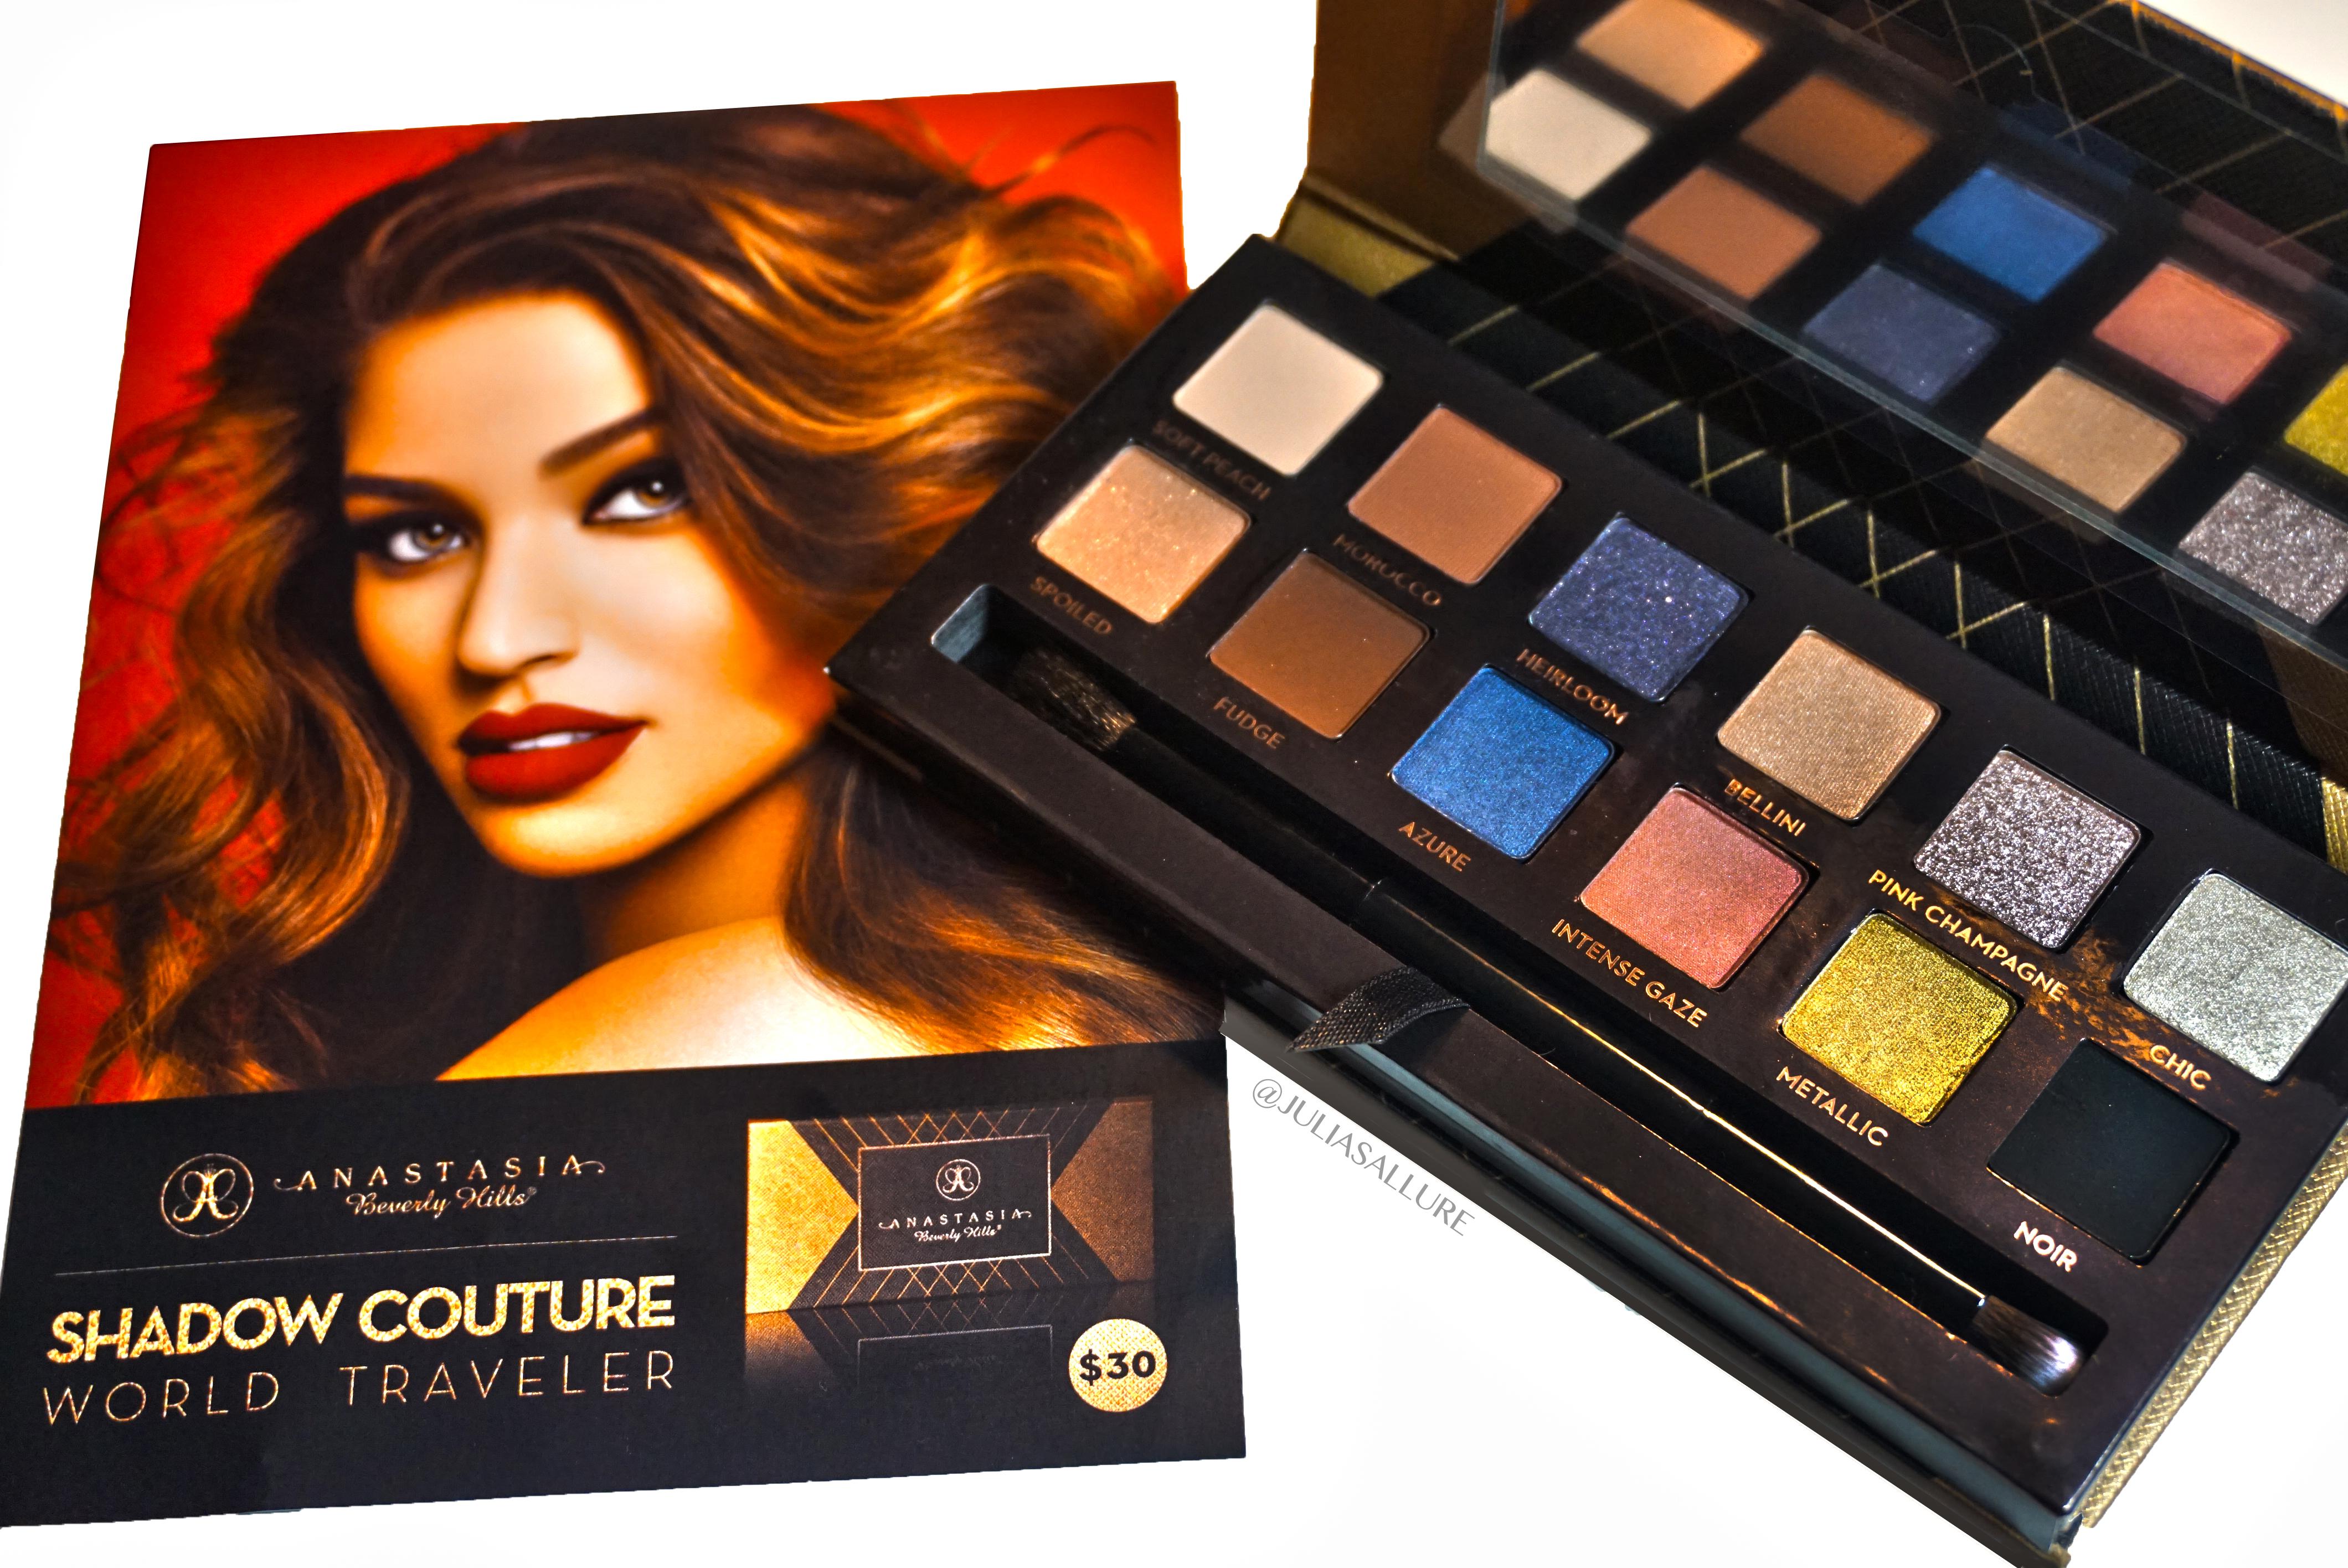 Anastasia Beverly Hills Shadow Couture World Traveler Eye Kuas Mascara Dsc04589